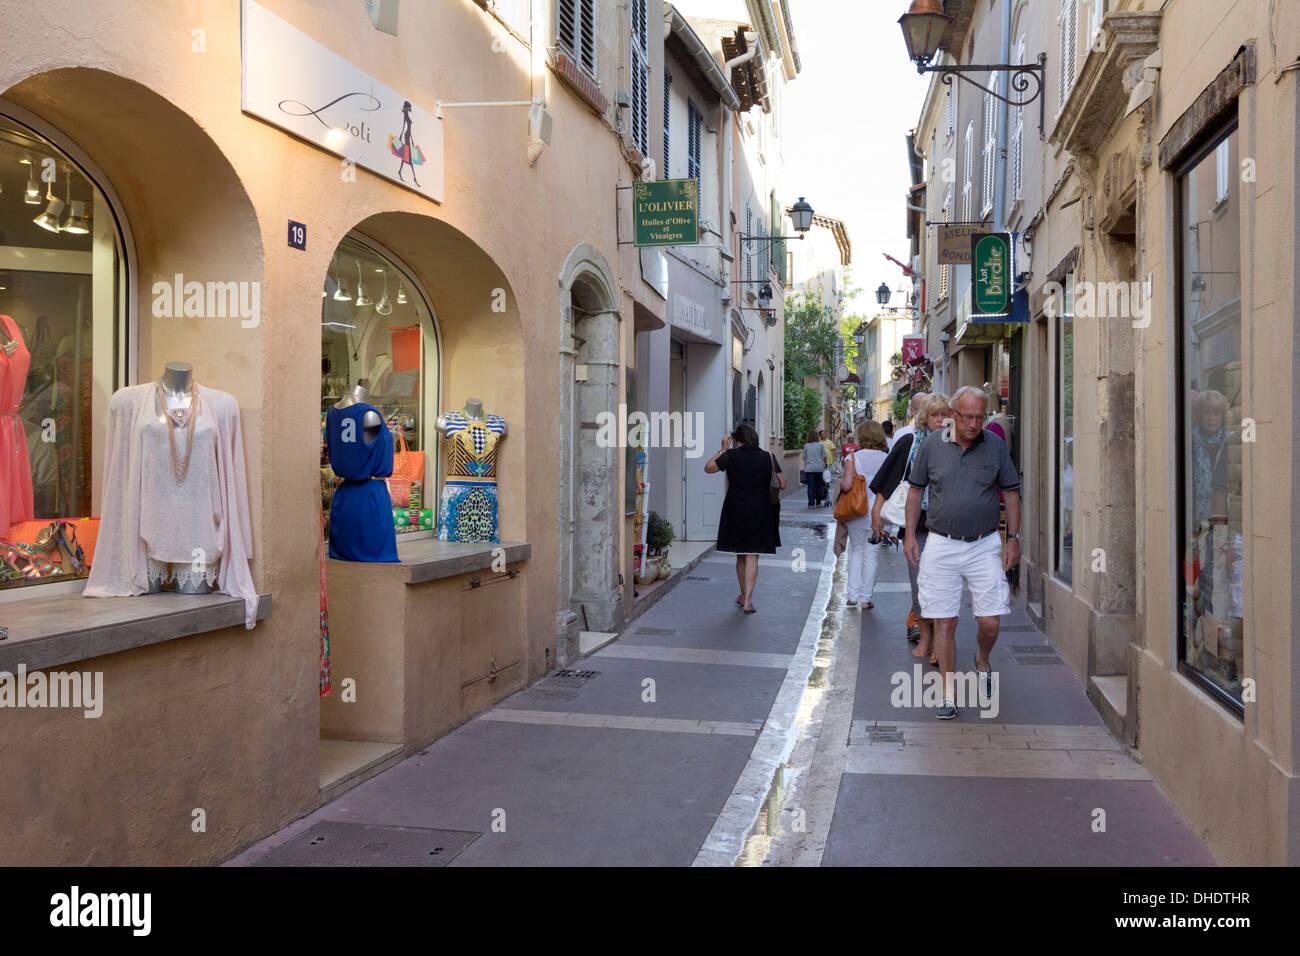 Boutiques in old town, Saint-Tropez, Var, Provence-Alpes-Cote d'Azur, Provence, France, Europe - Stock Image